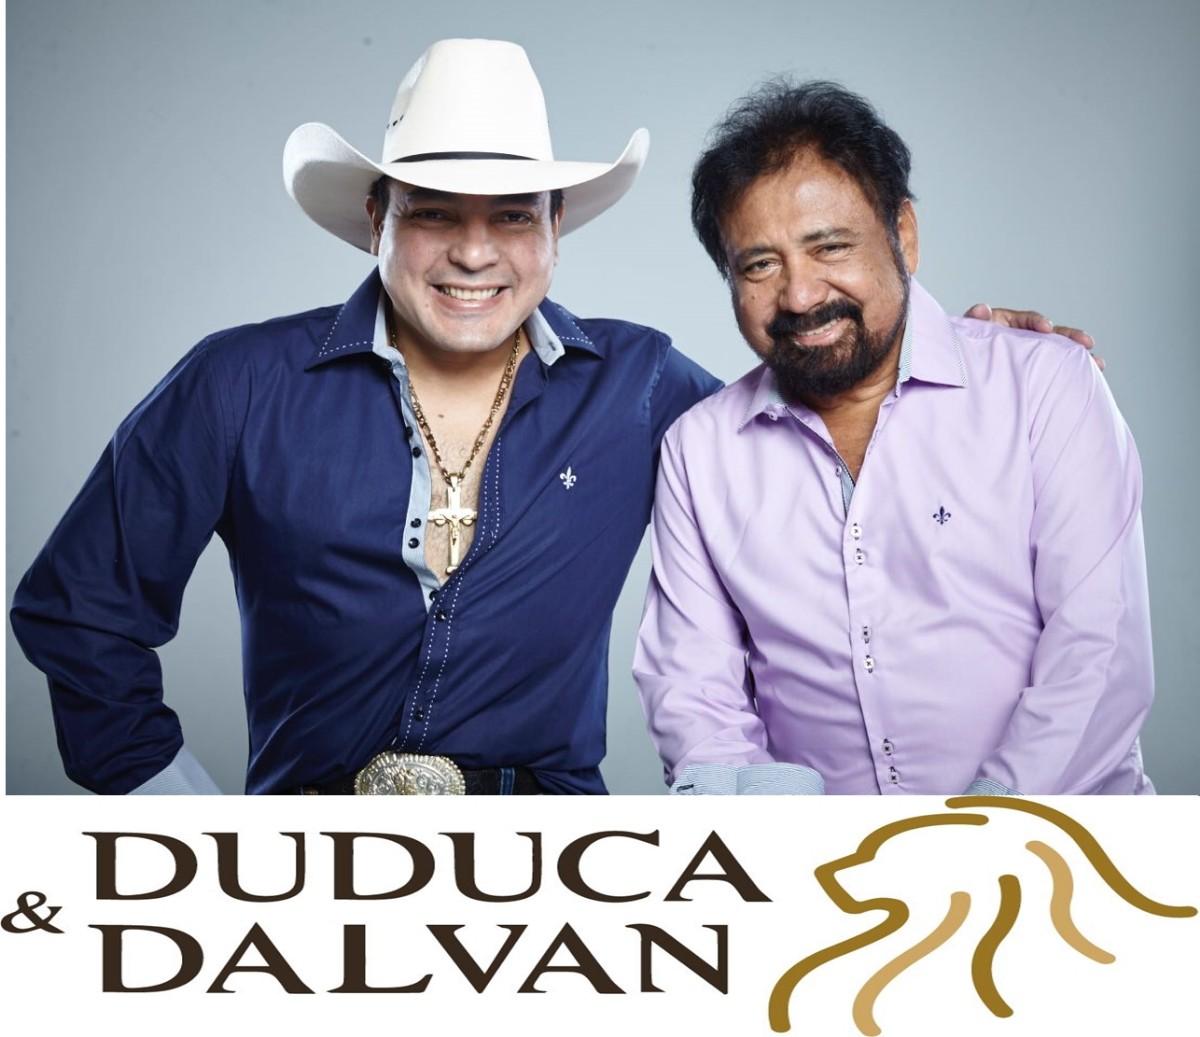 Duduca & Dalvan